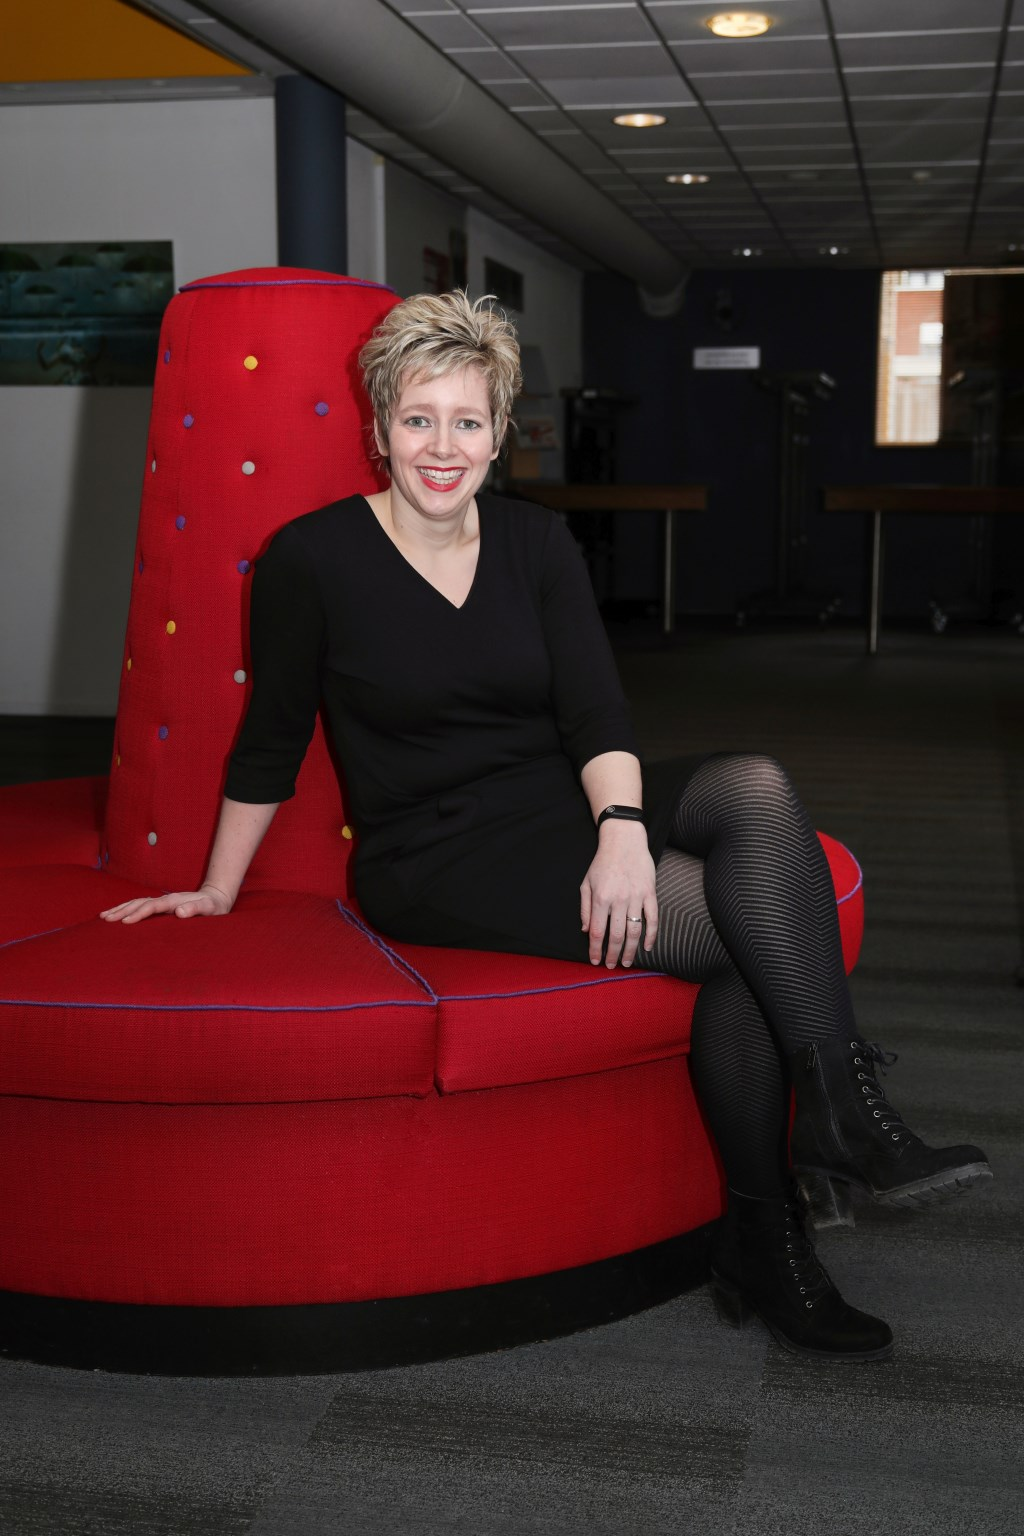 Mirella Jellema interviewde deze week Anne-Marie Jung voor dé Weekkrant Noordoost-Twente. Suus' FotoSjop © Persgroep